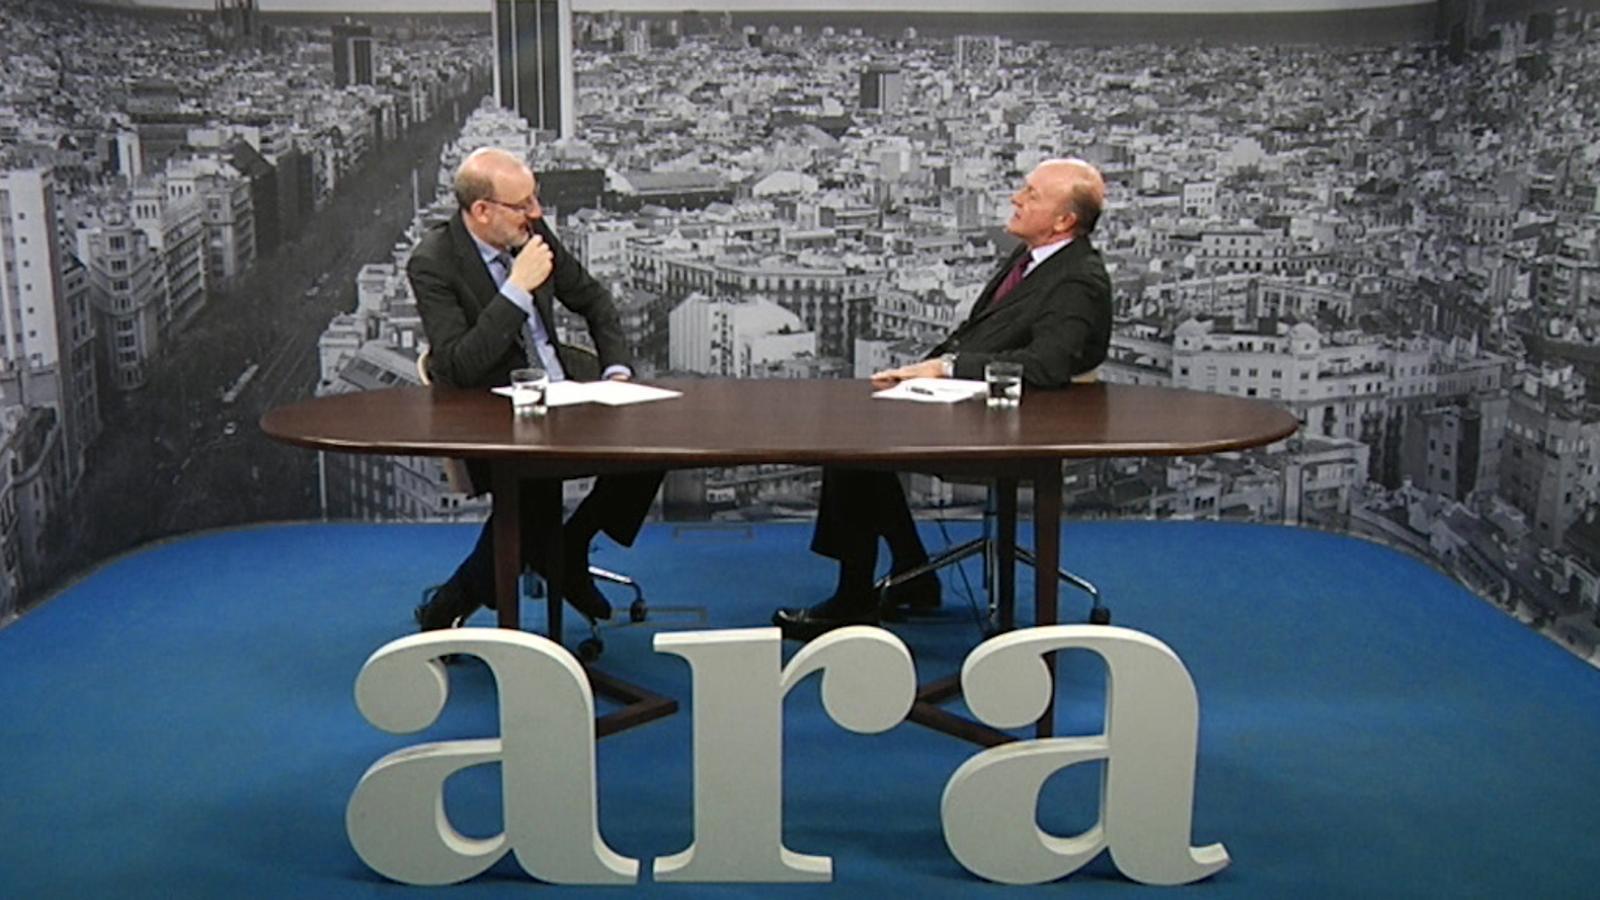 Entrevista d'Antoni Bassas a Enric Lacalle